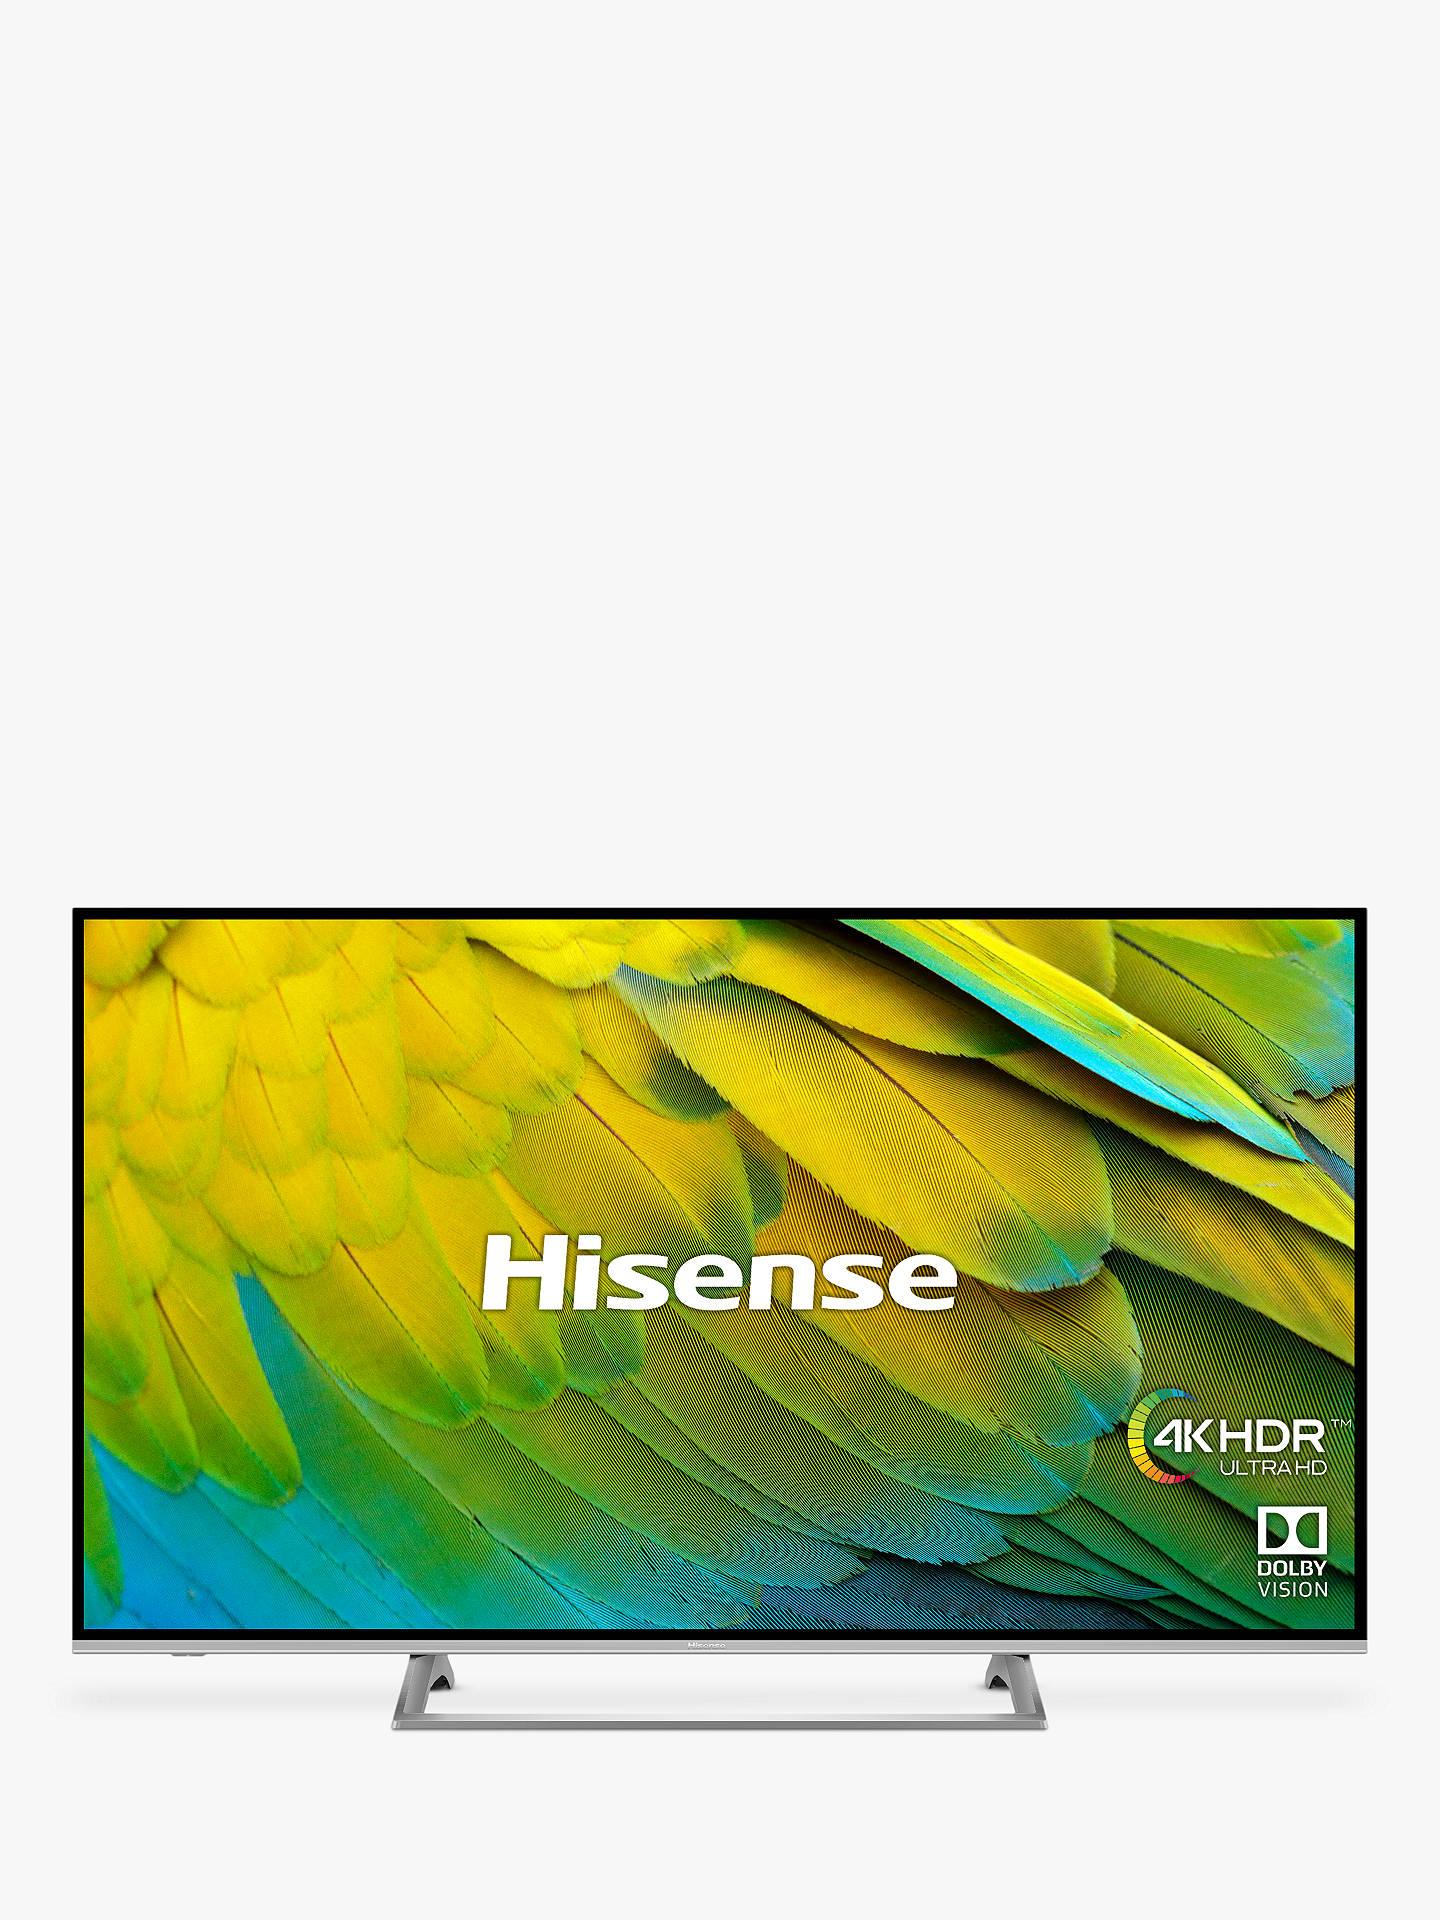 "Hisense H43B7500UK (2019) LED HDR 4K Ultra HD Smart TV, 43"" with Freeview Play, Black/Silver £279 John Lewis & Partners"